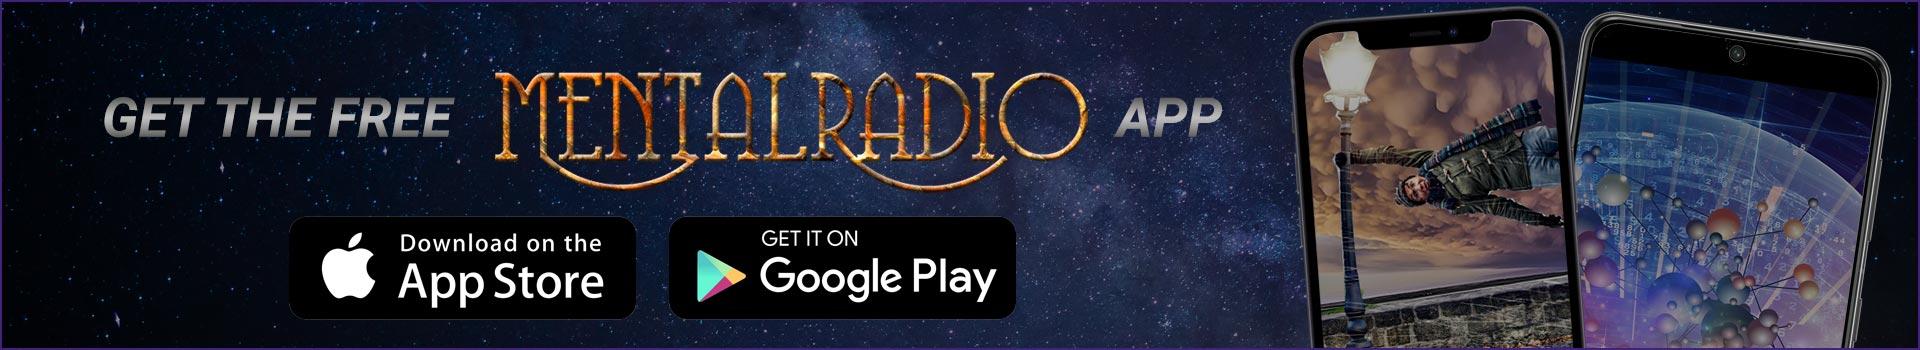 Get The Free Mental Radio App